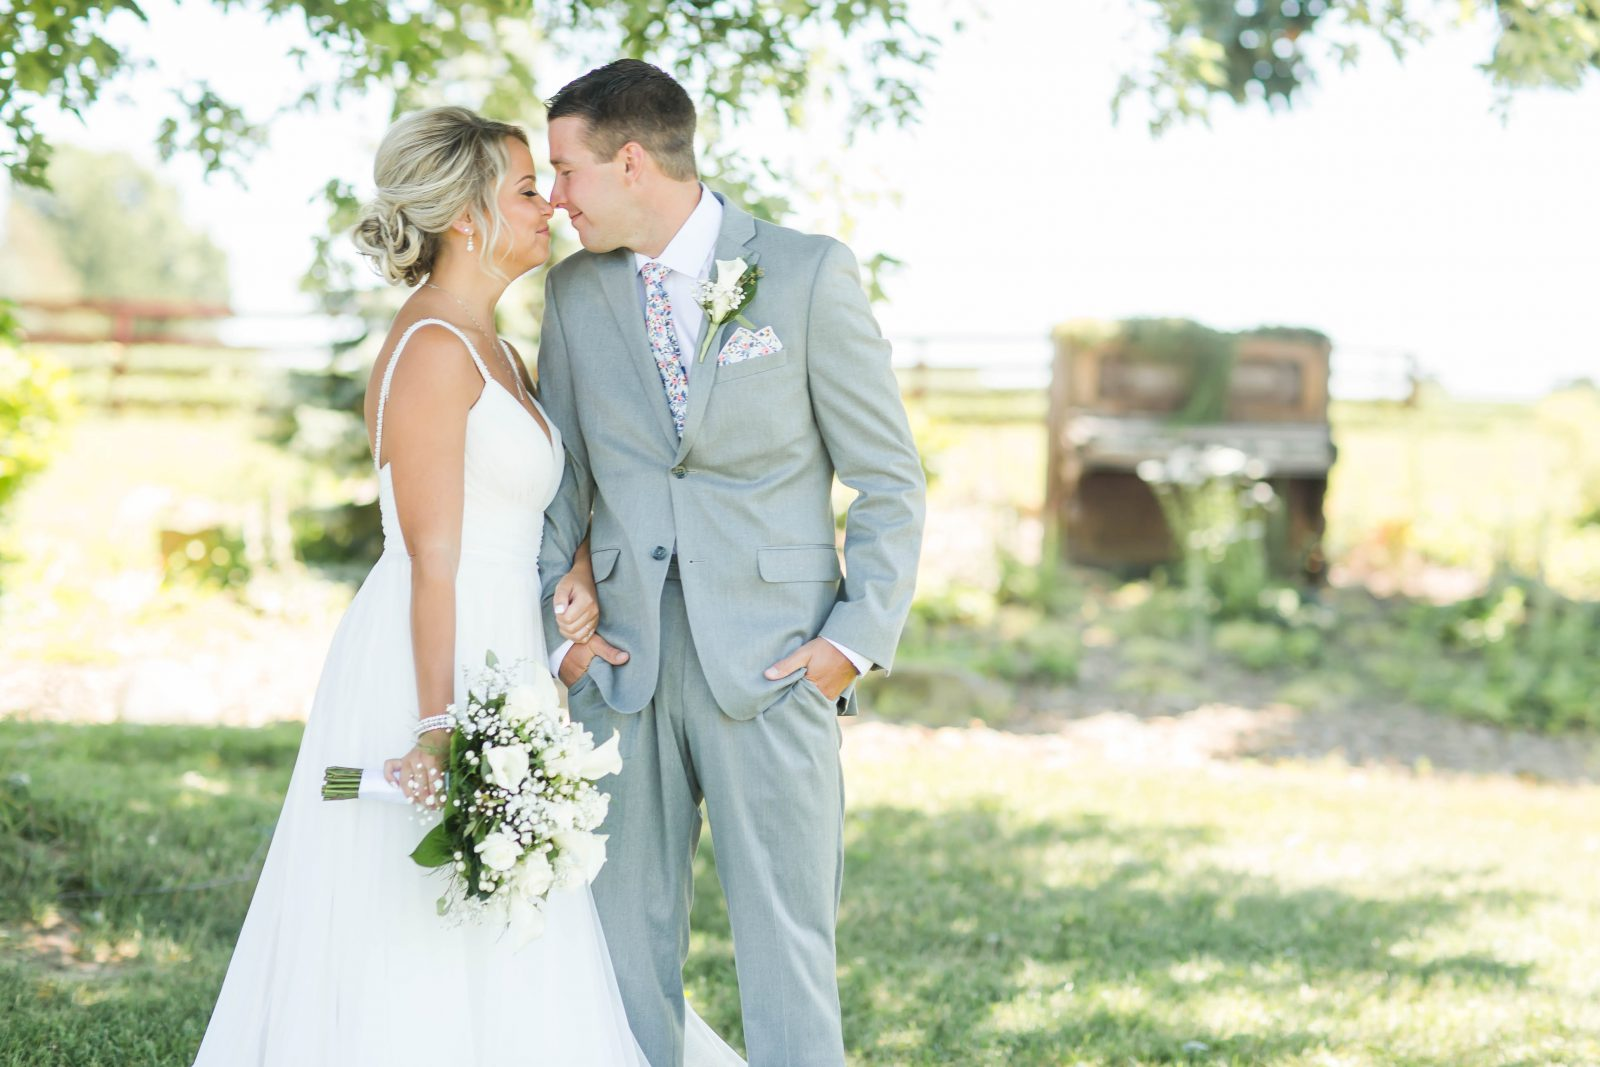 peacock-ridge-summer-wedding-photographer-akron-ohio-loren-jackson-photography-31